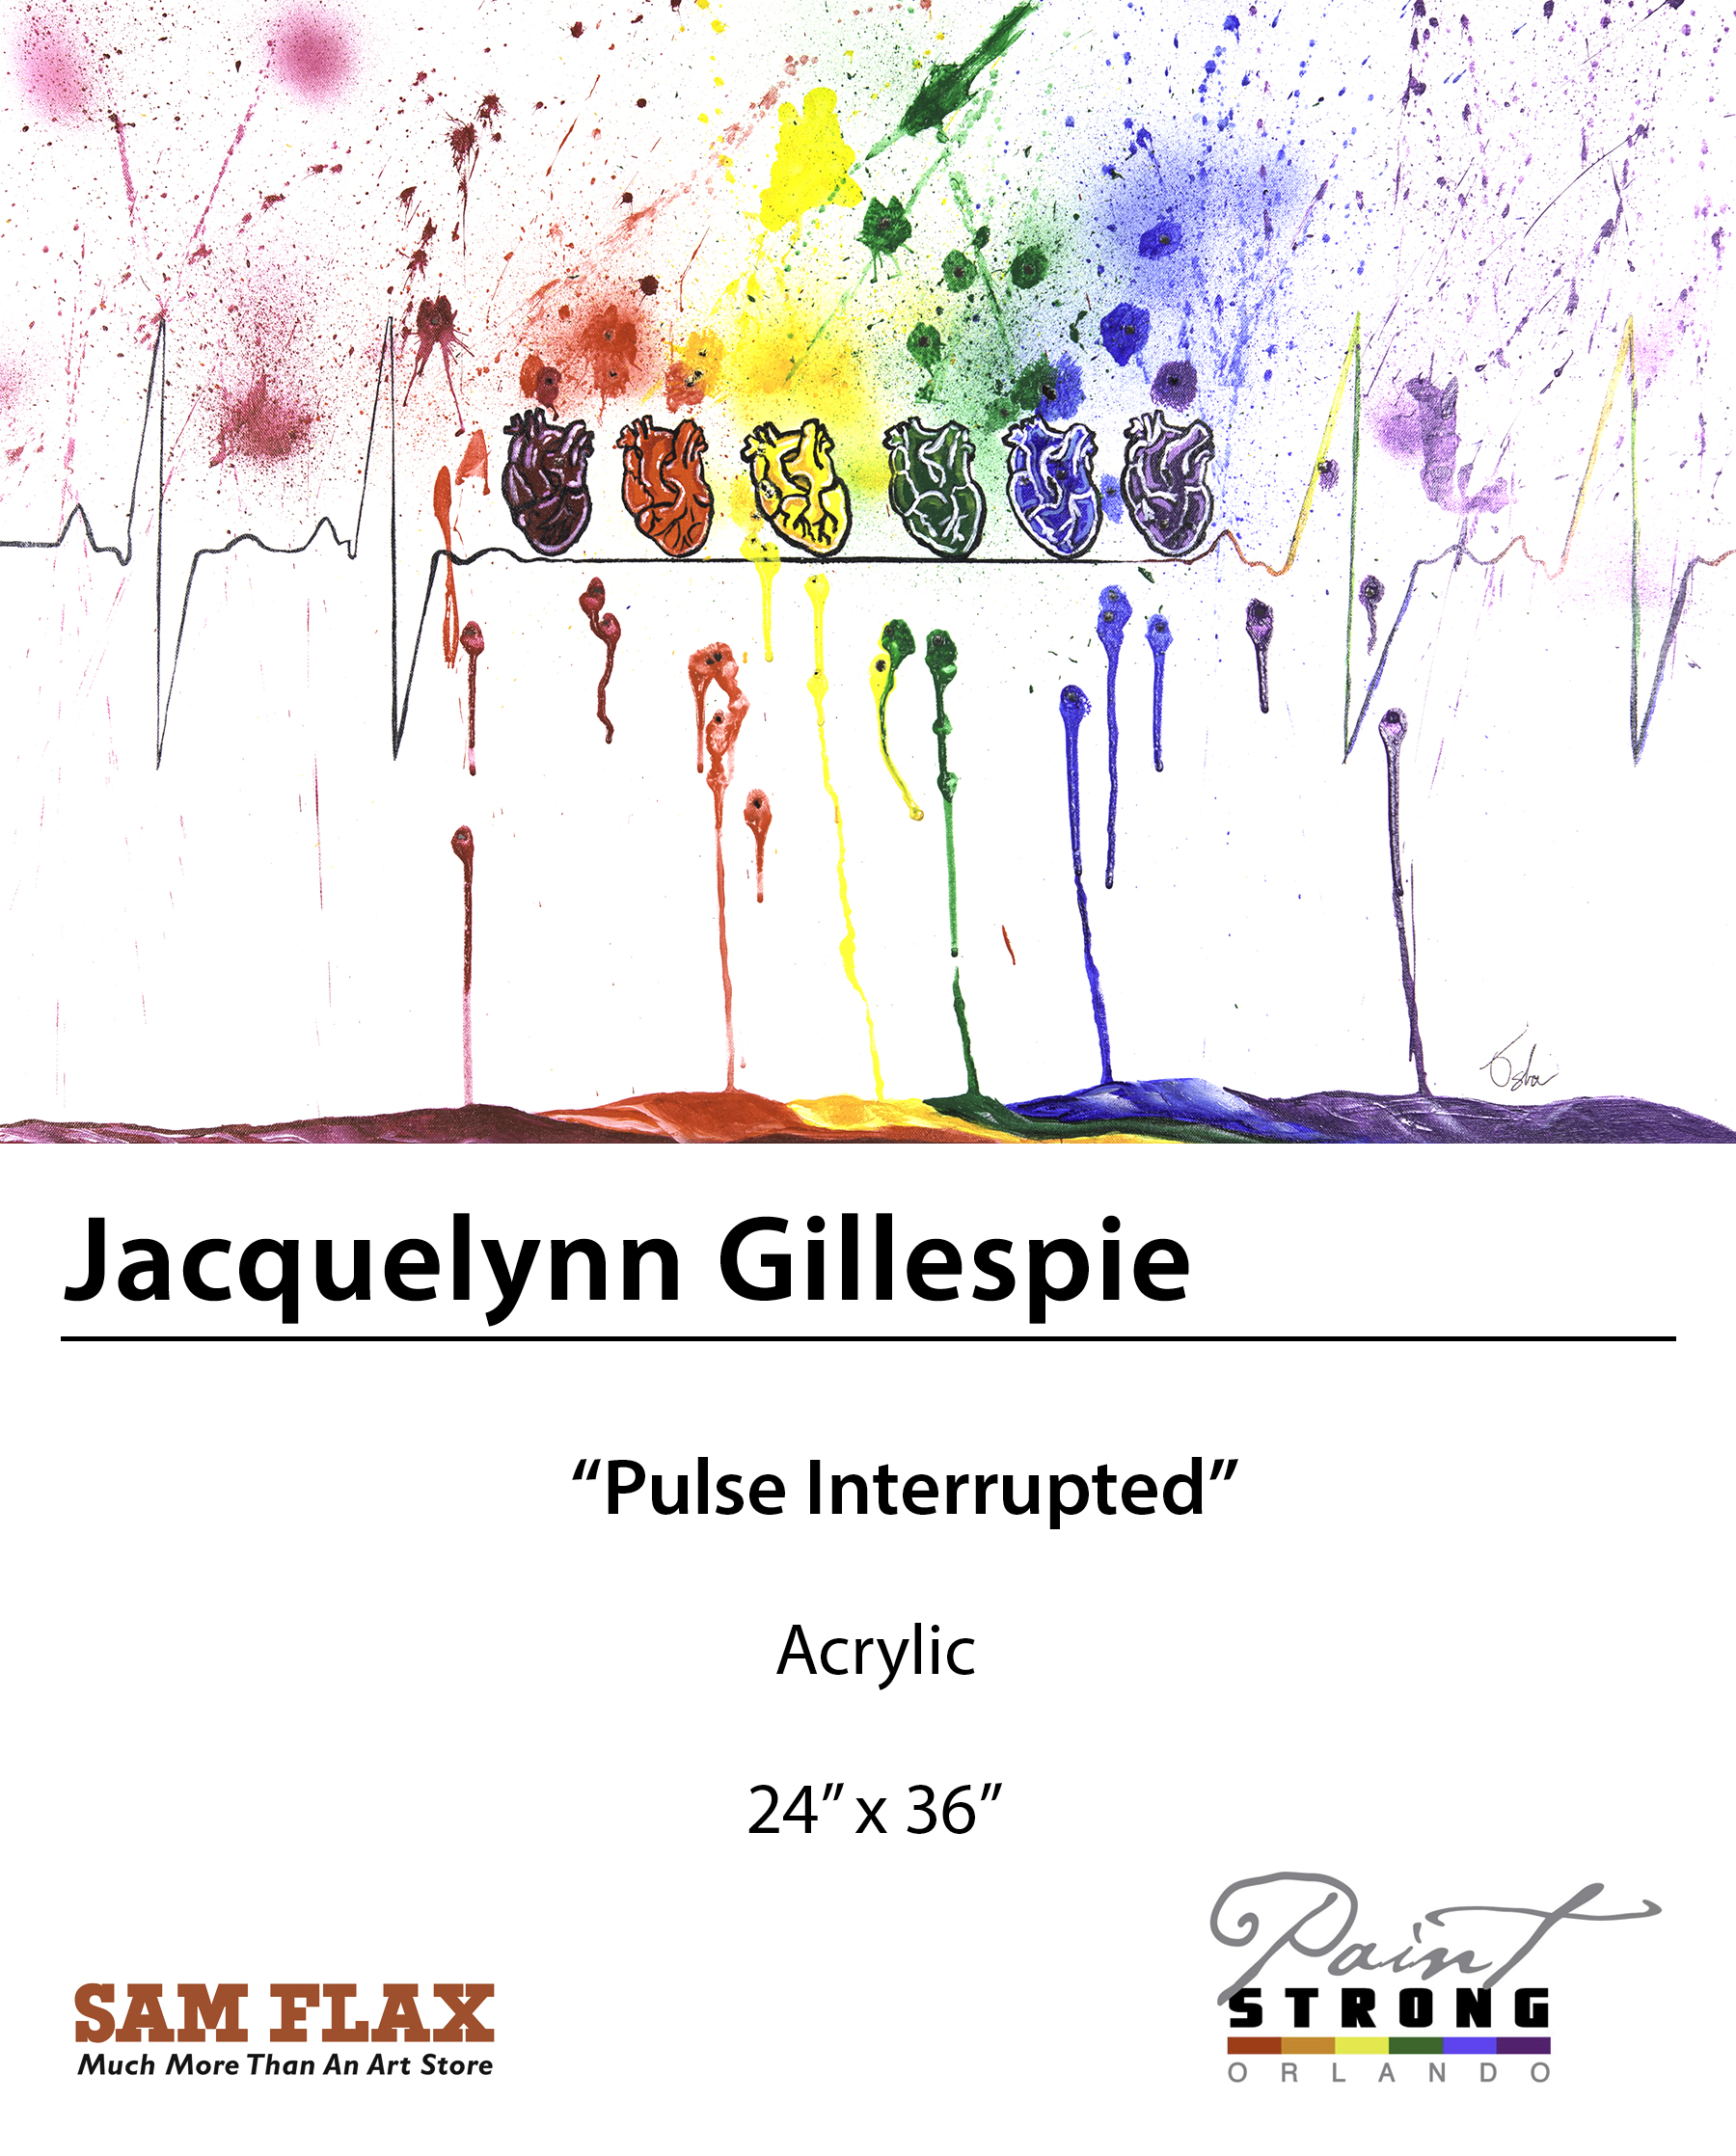 Jacquelynn Gillespie